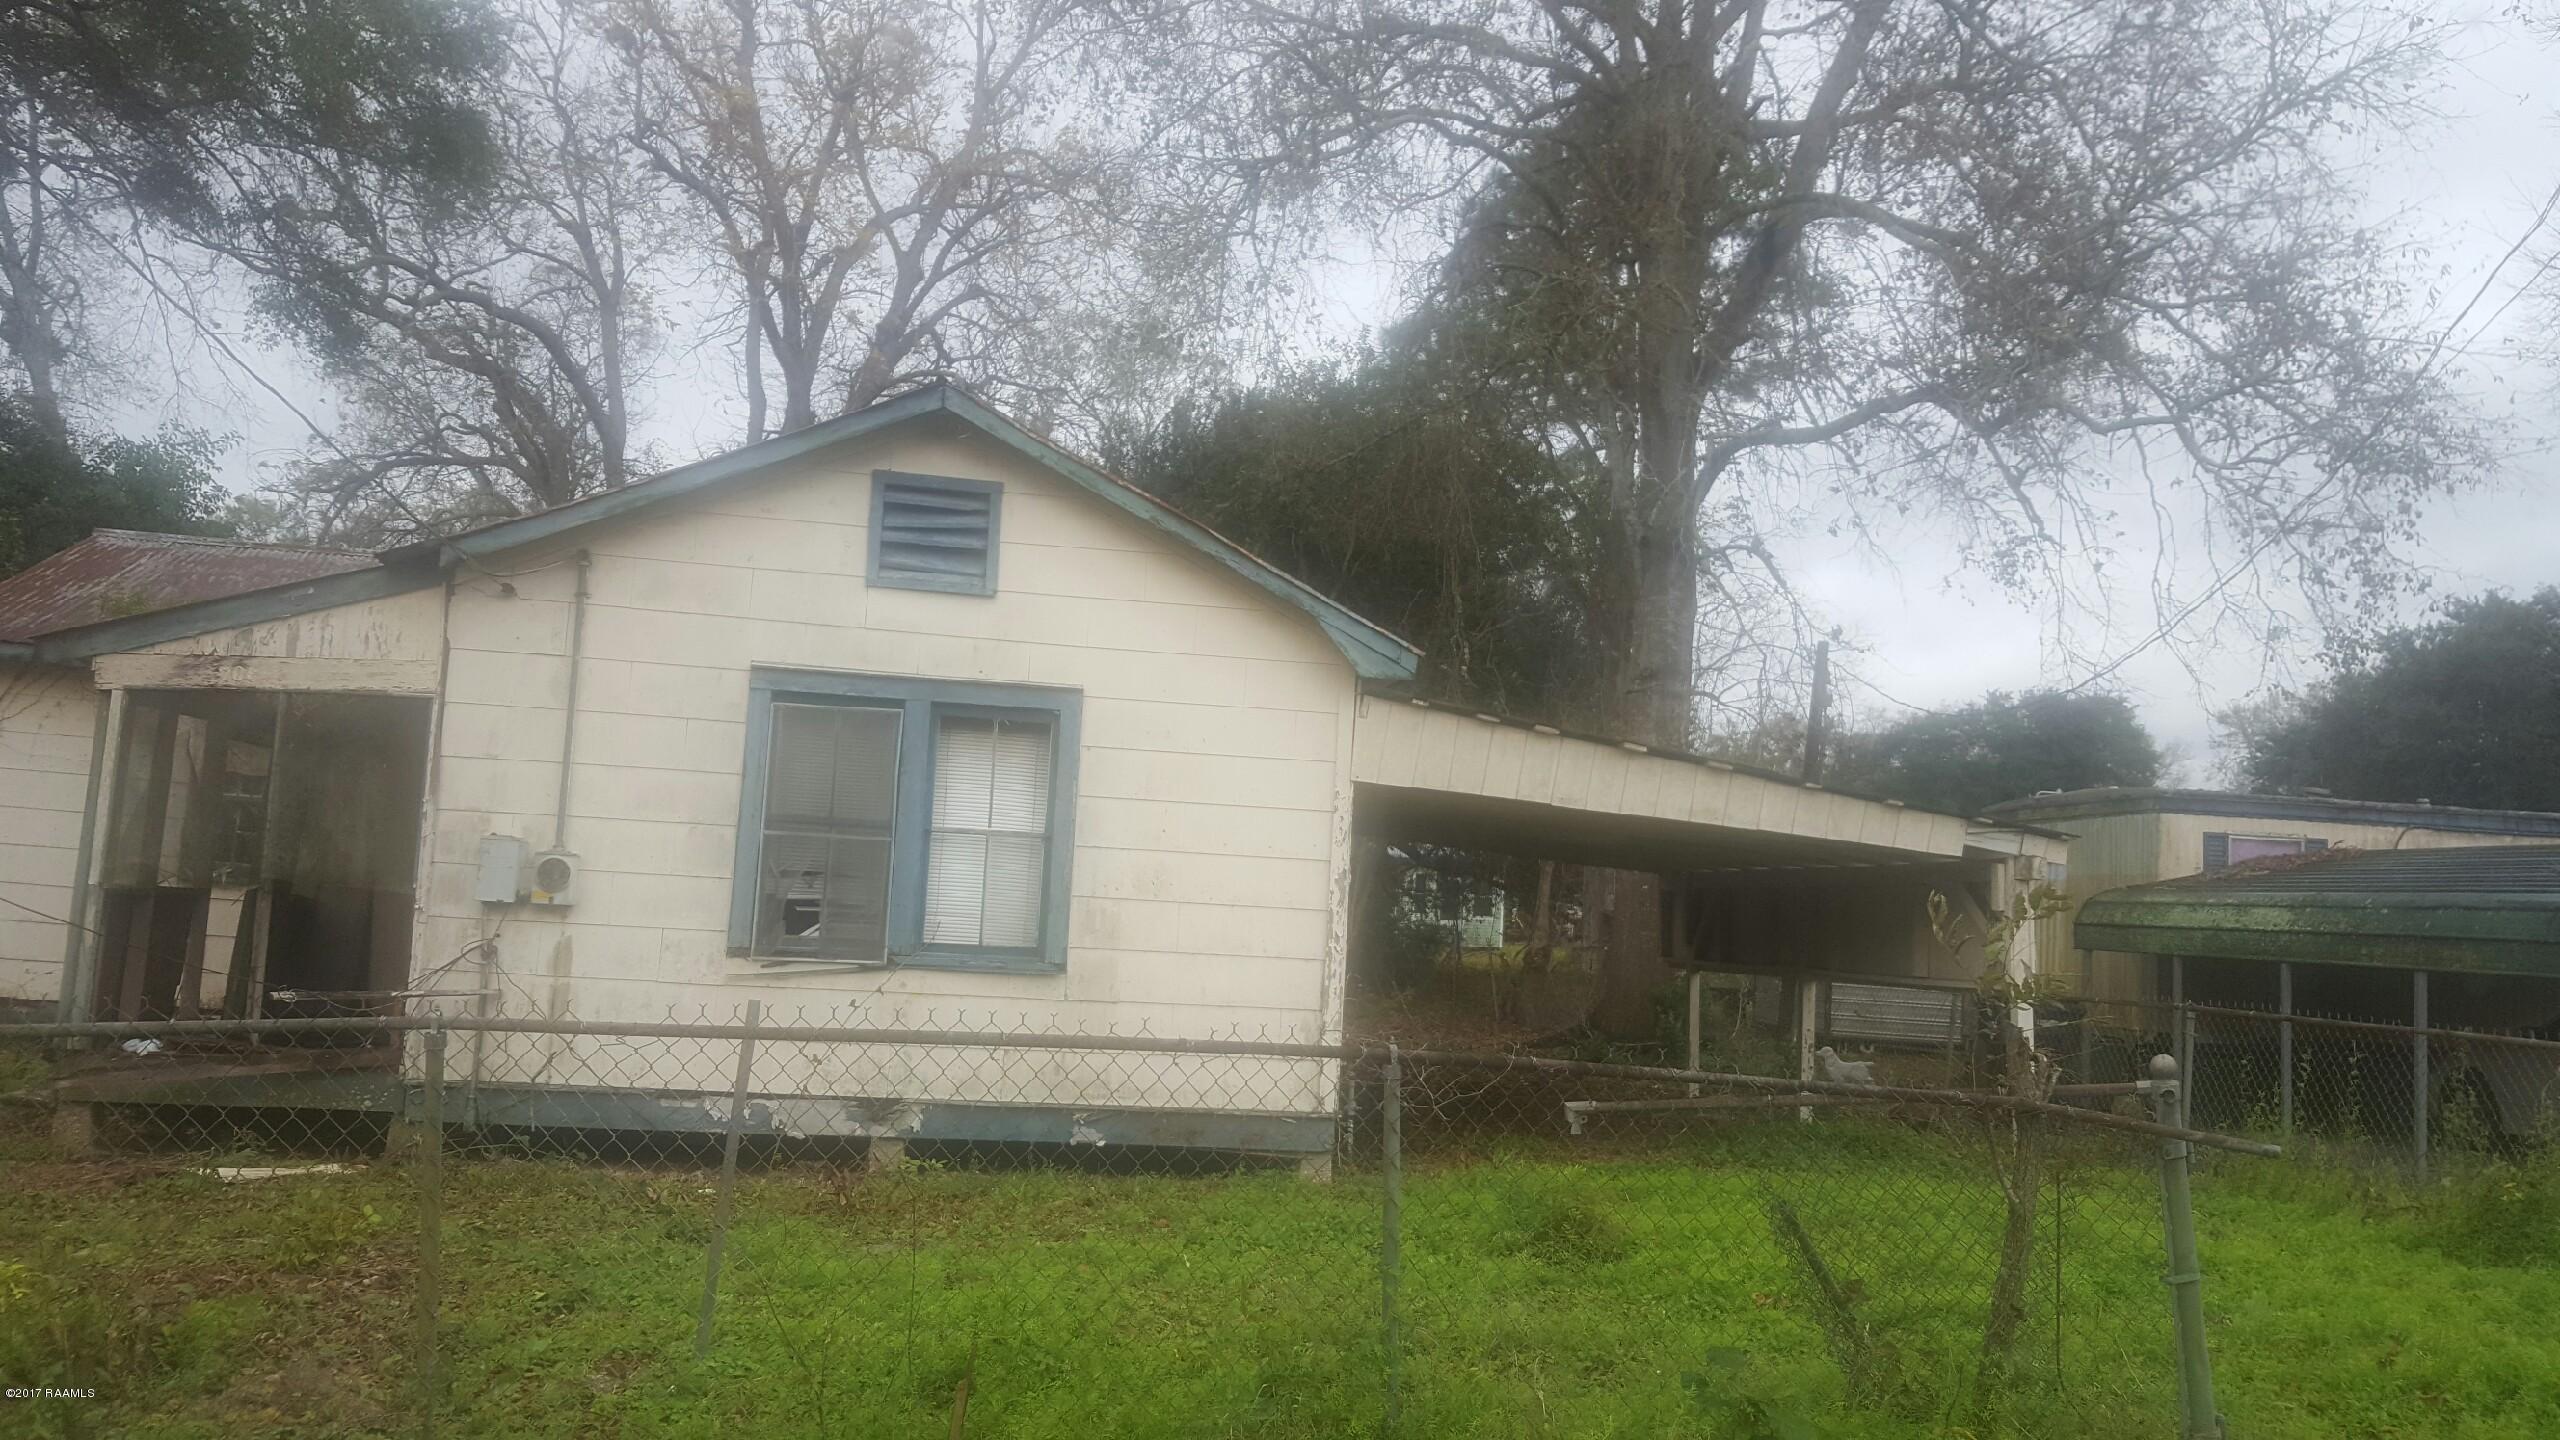 706 Hubertville Road, Jeanerette, LA 70544 Photo #1